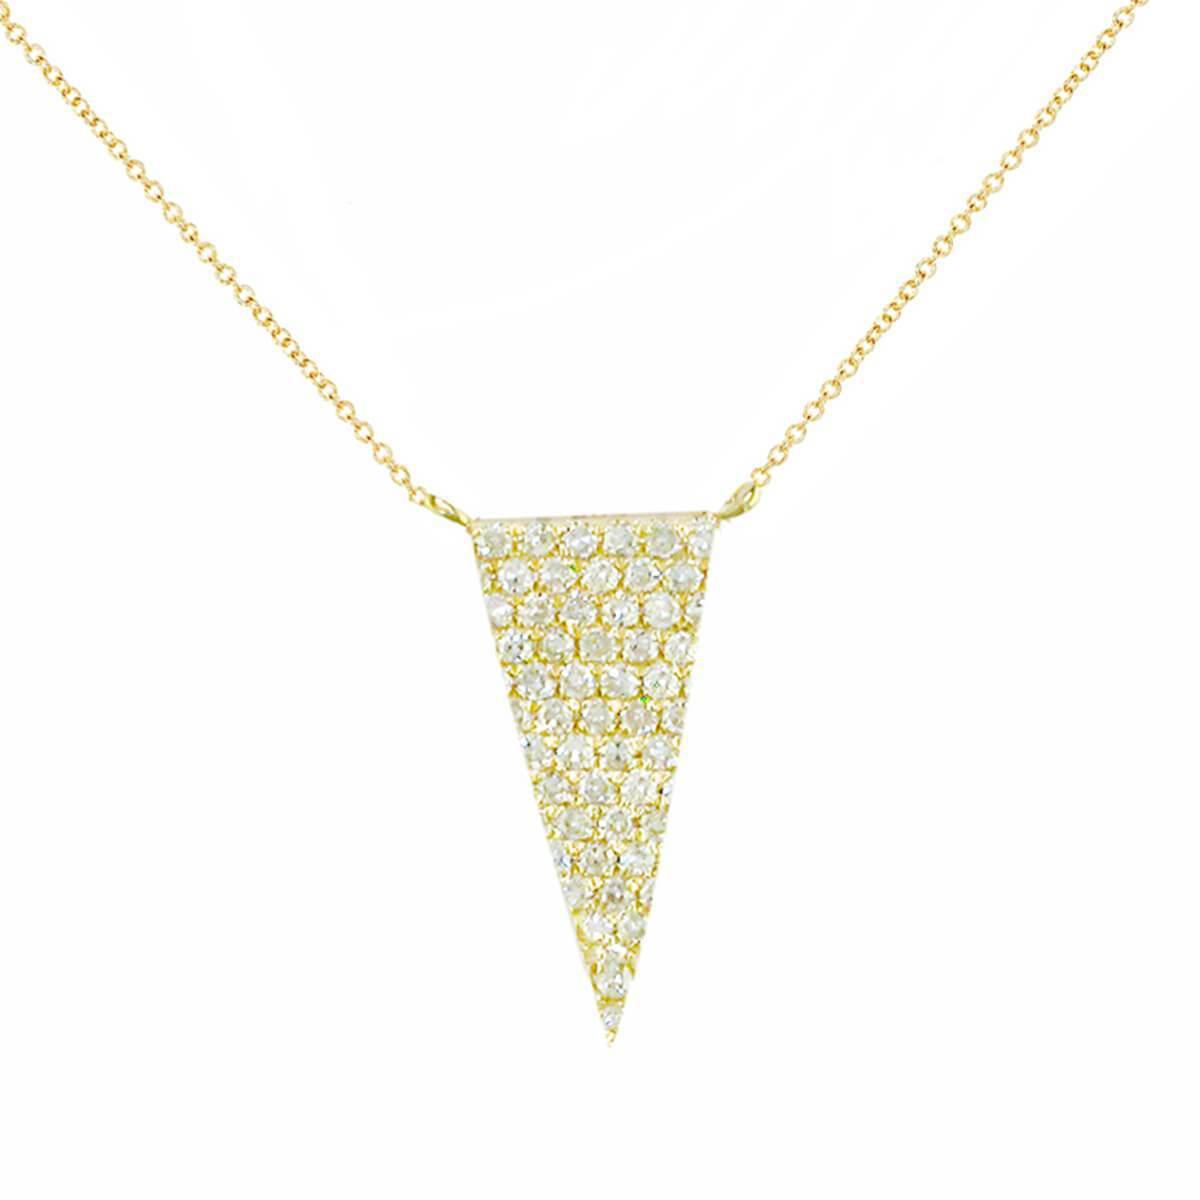 London Road Jewellery White Gold Diamond Geo Pendant Necklace - 0.07cts 0MsGB4